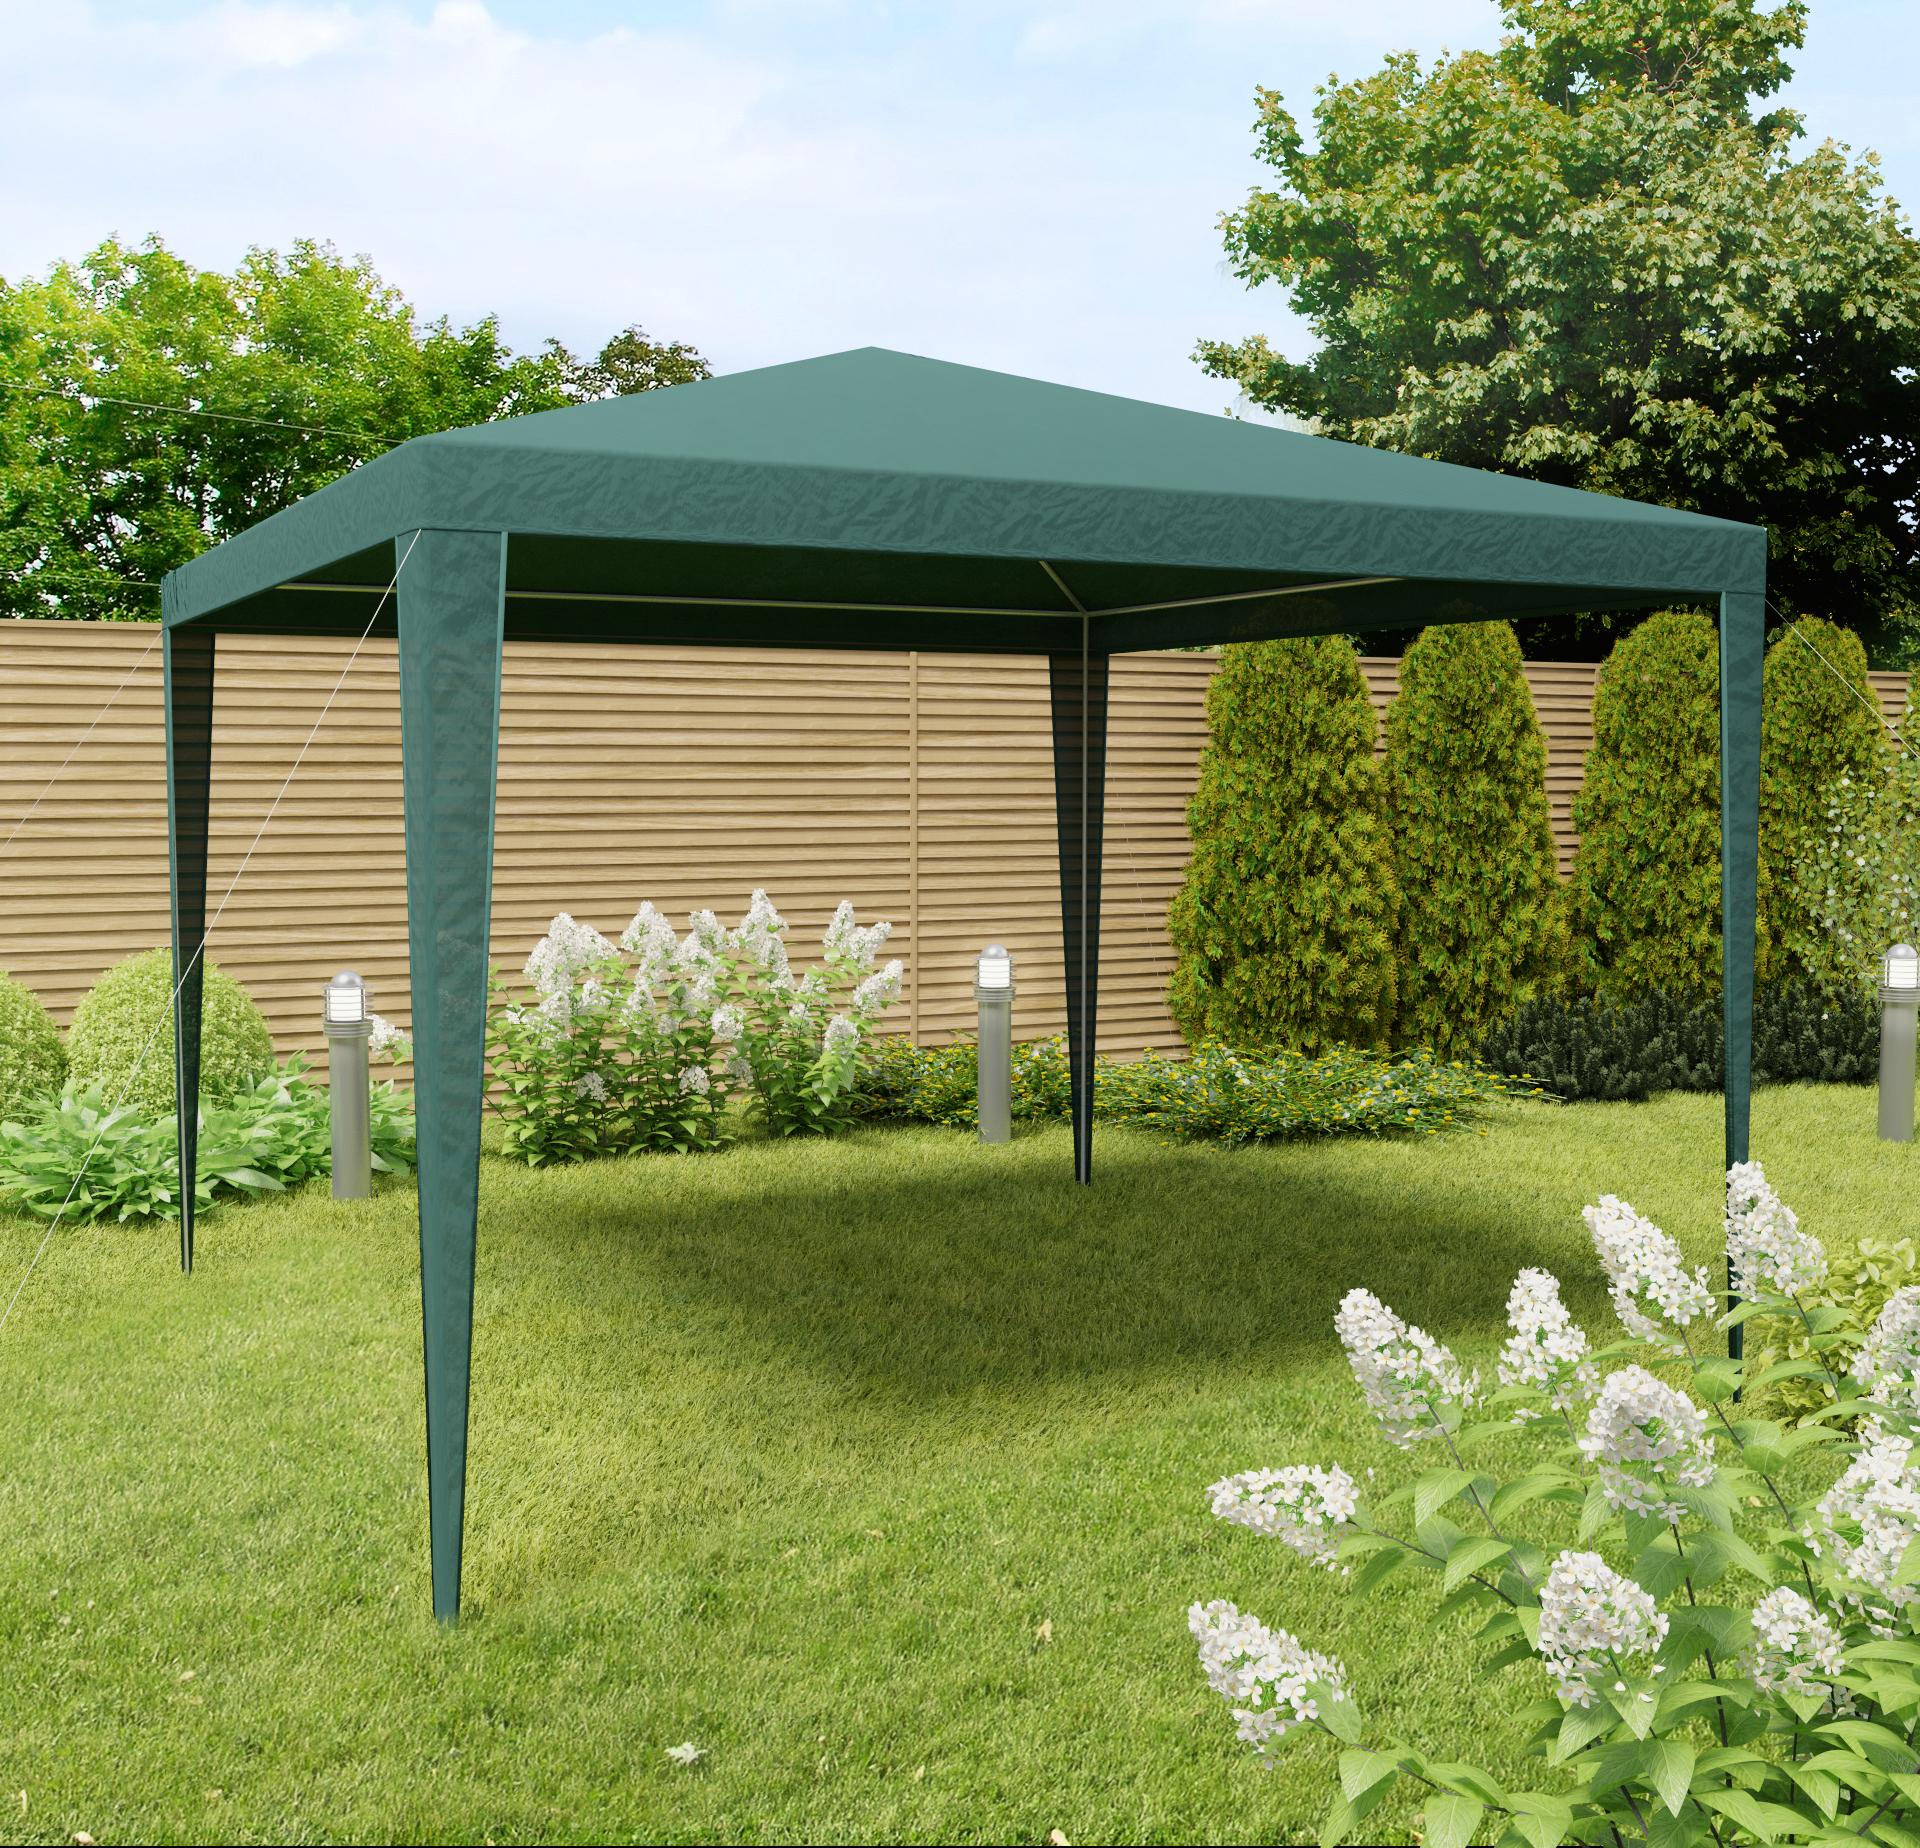 pavillon gartenpavillon partyzelt zelt garten 3x3 gr n ebay. Black Bedroom Furniture Sets. Home Design Ideas